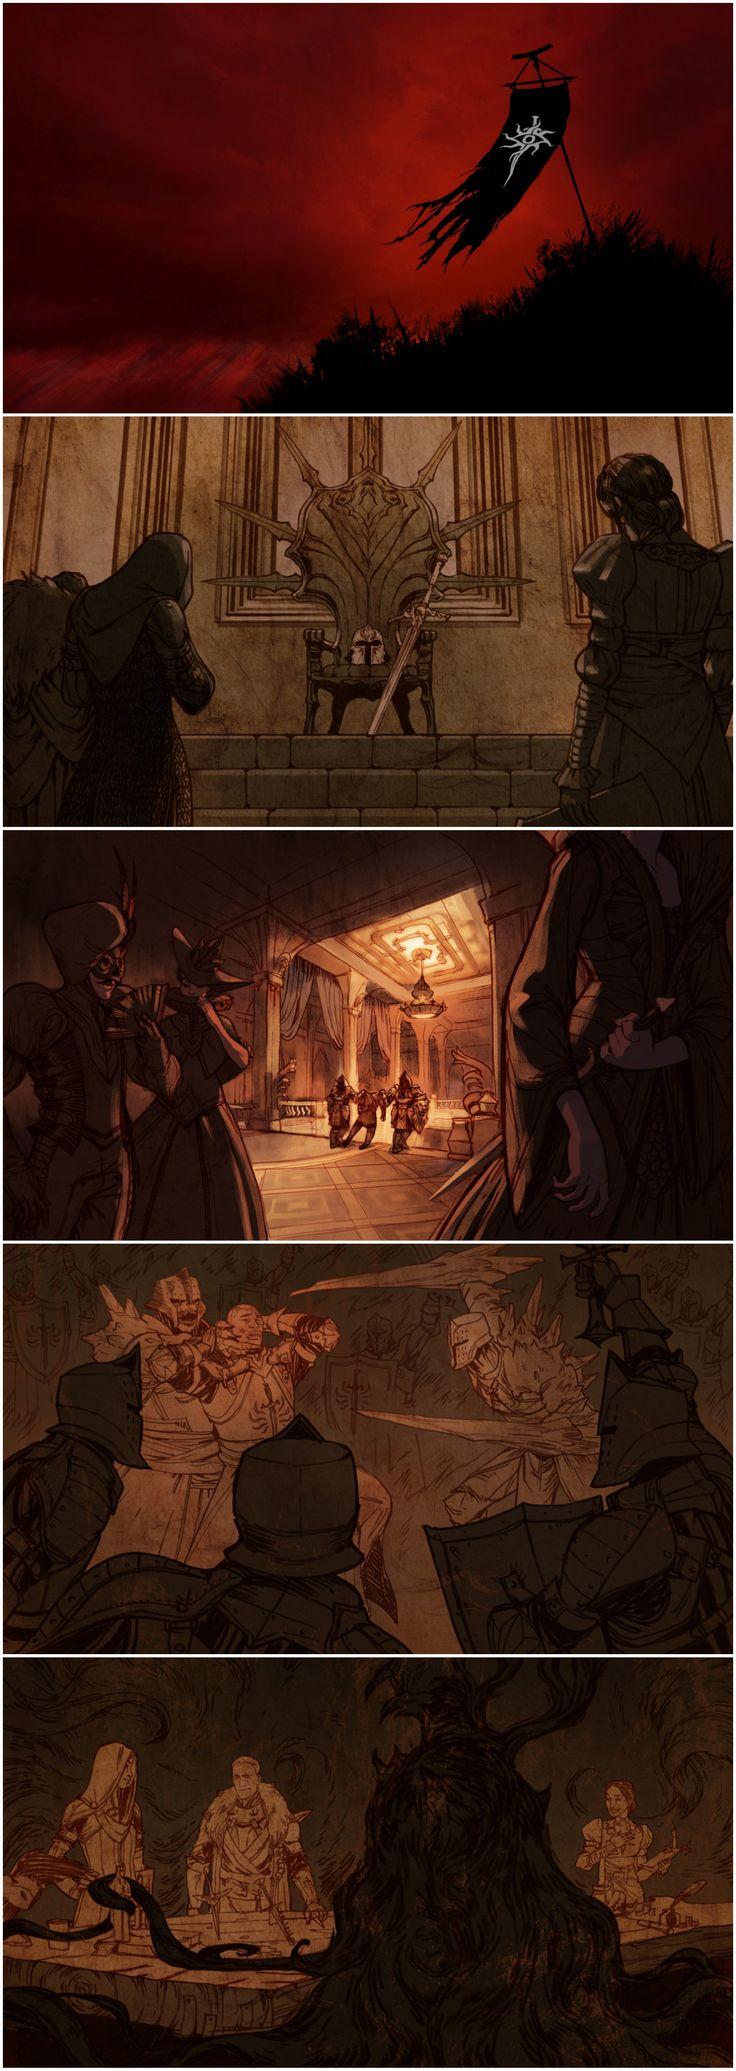 Dragon Age: Inquisition - mission failure screen art